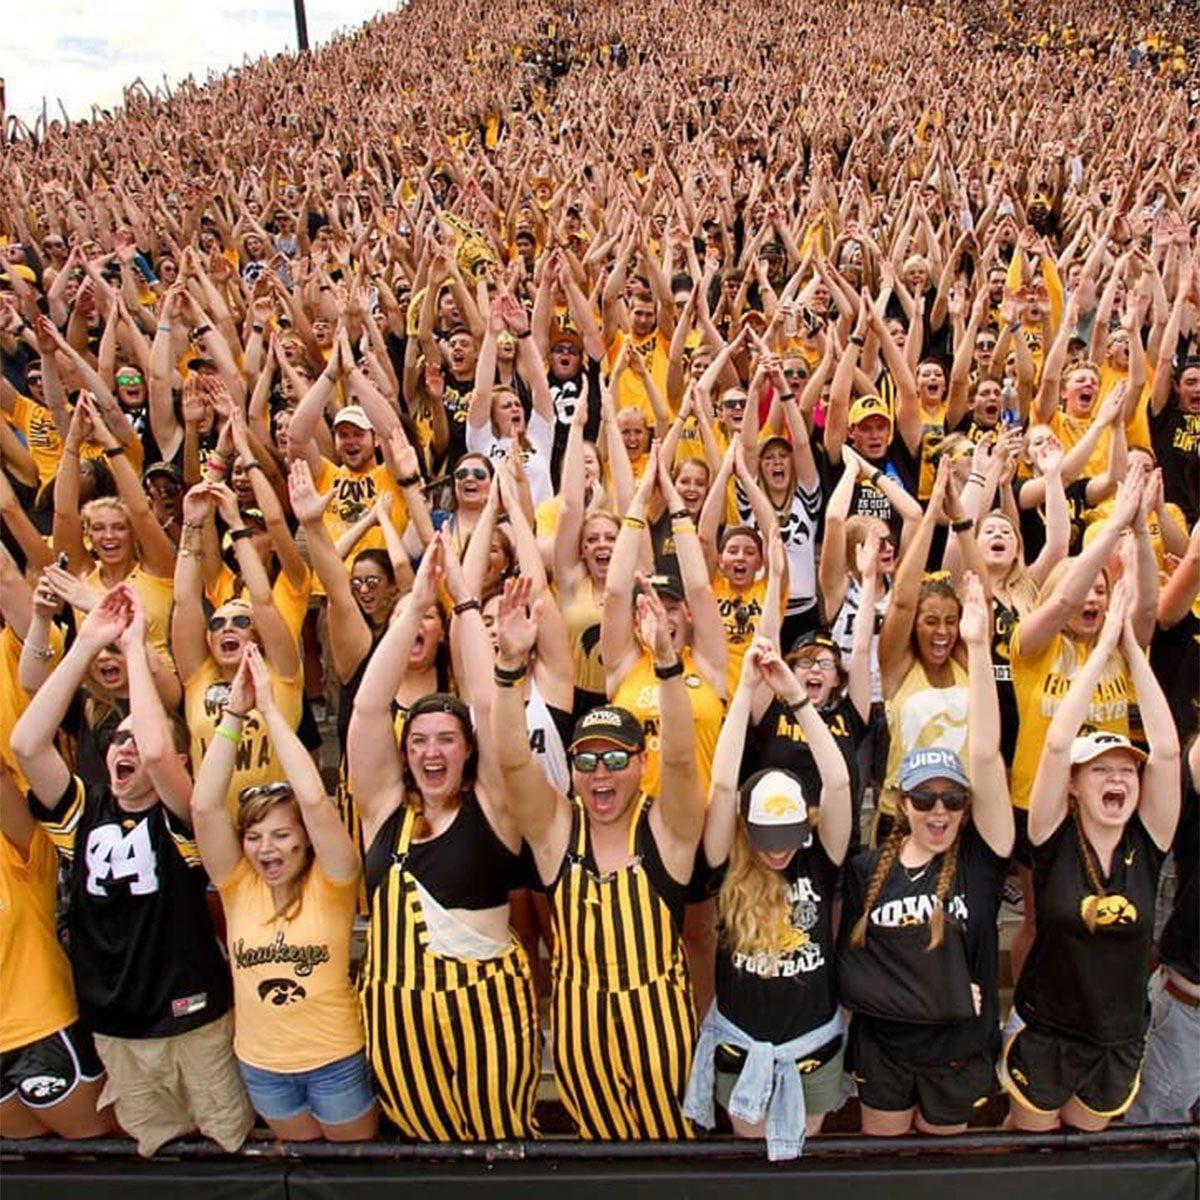 University of Iowa fans cheering